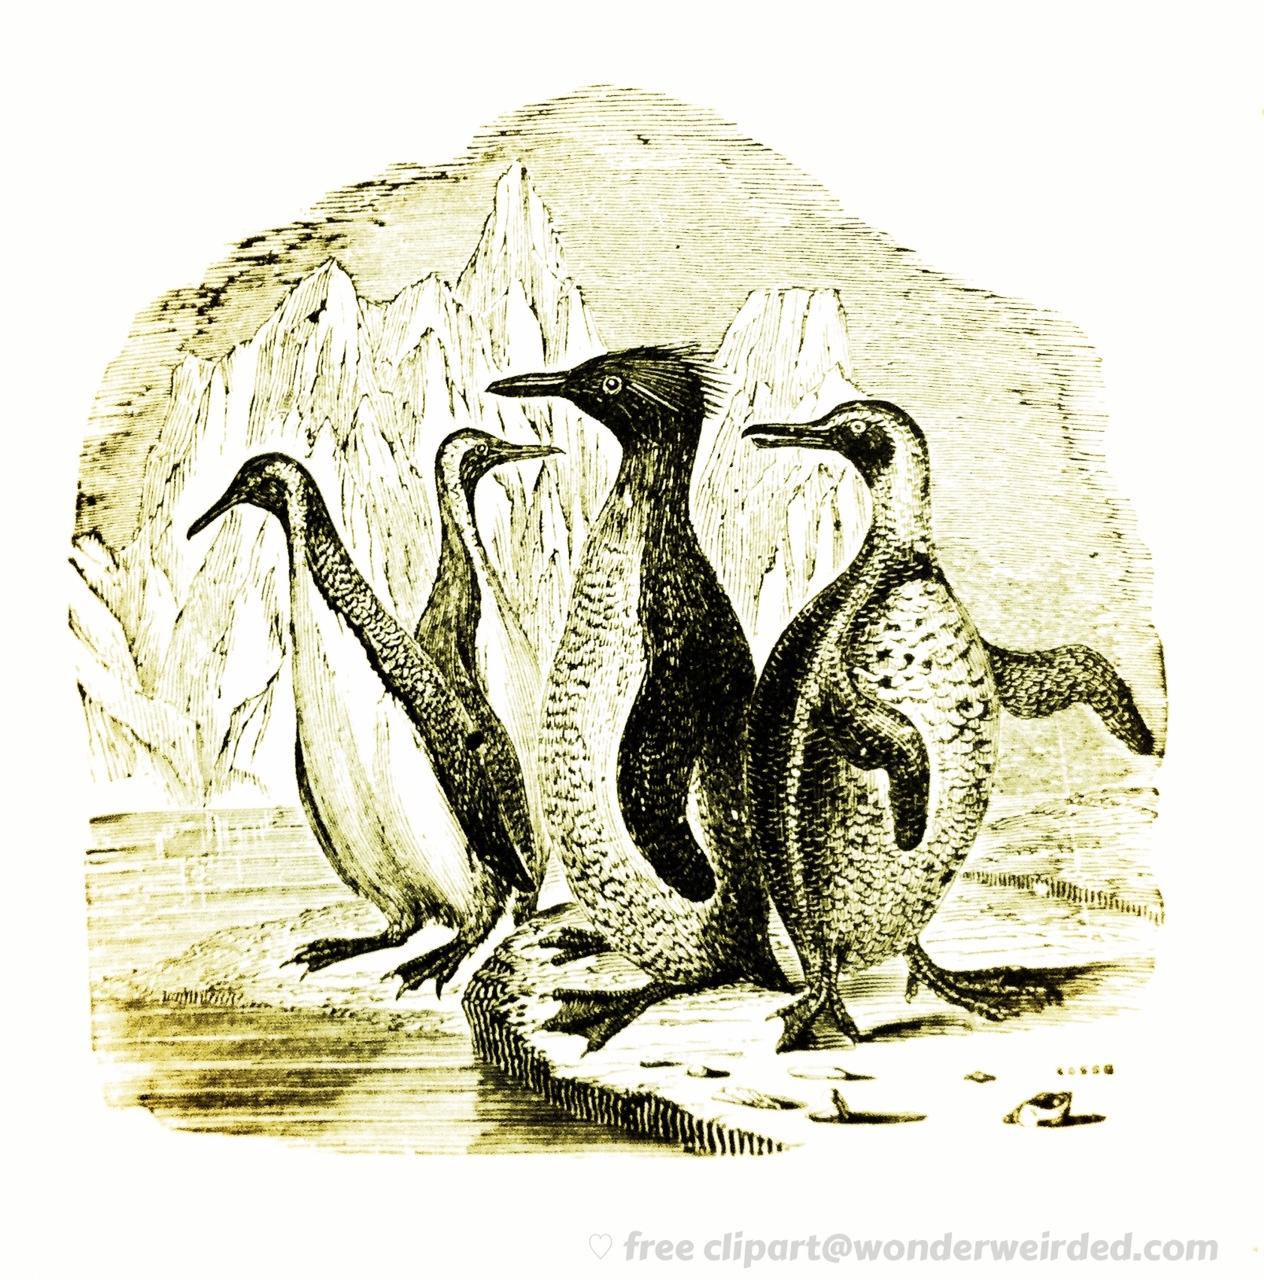 Penguin clipart vintage Art of Illustration Wonderweirded Engraving